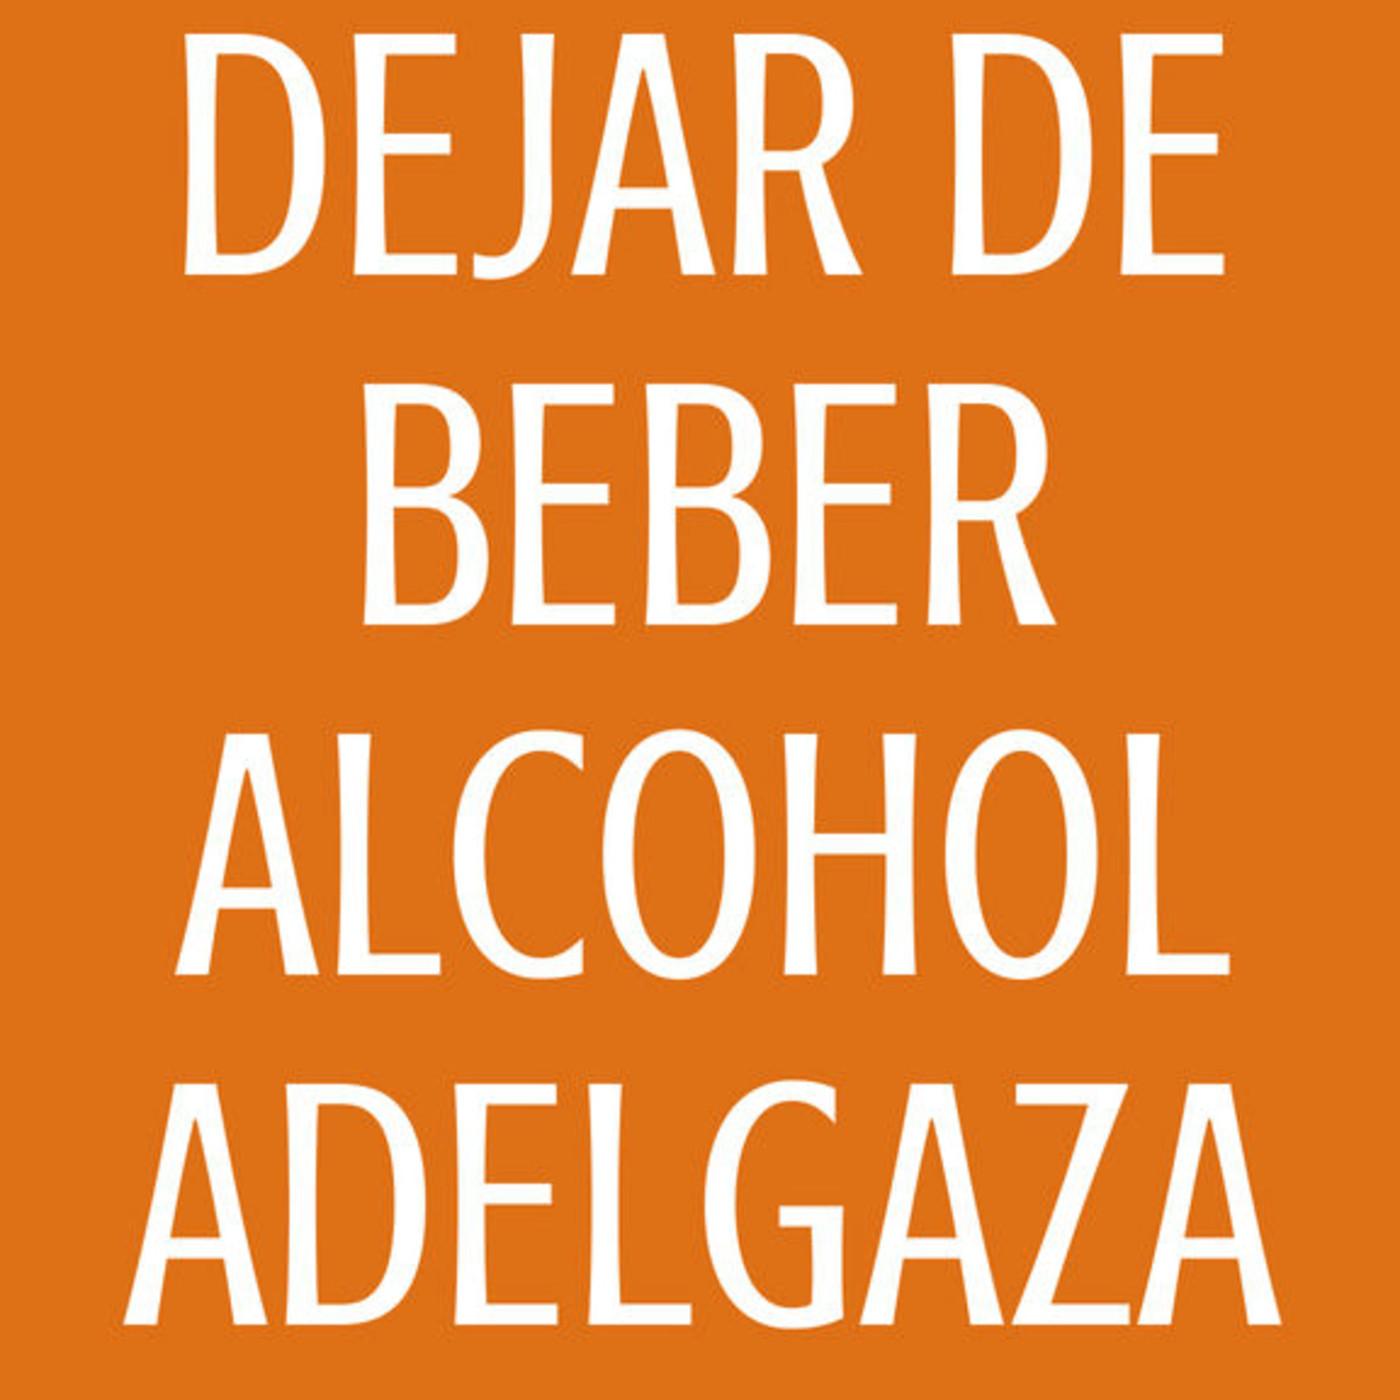 no tomar alcohol adelgaza